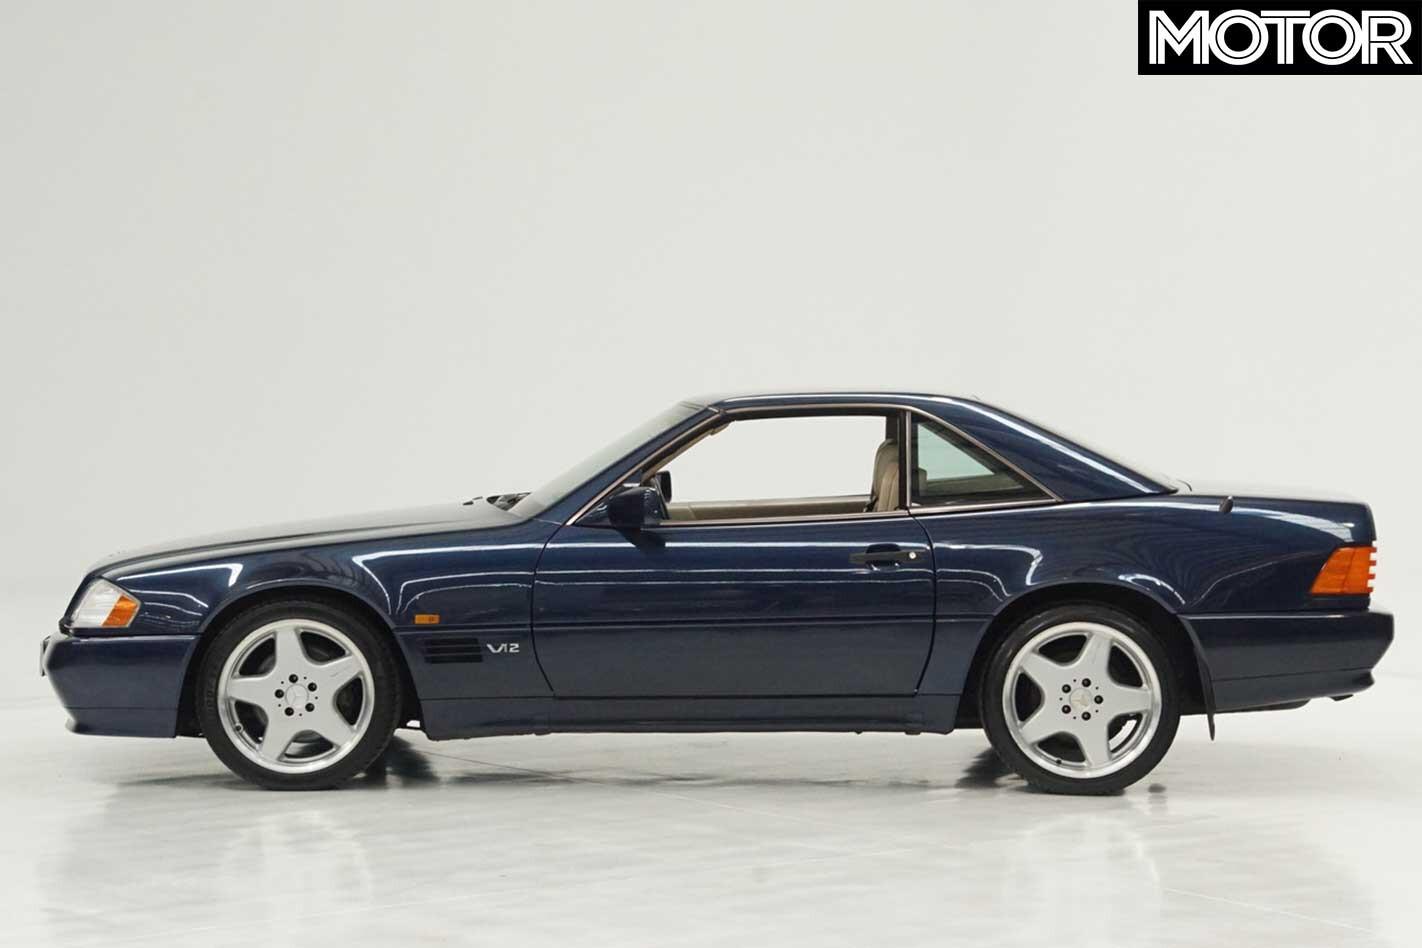 1994 Mercedes Benz SL 600 Shannons Jpg